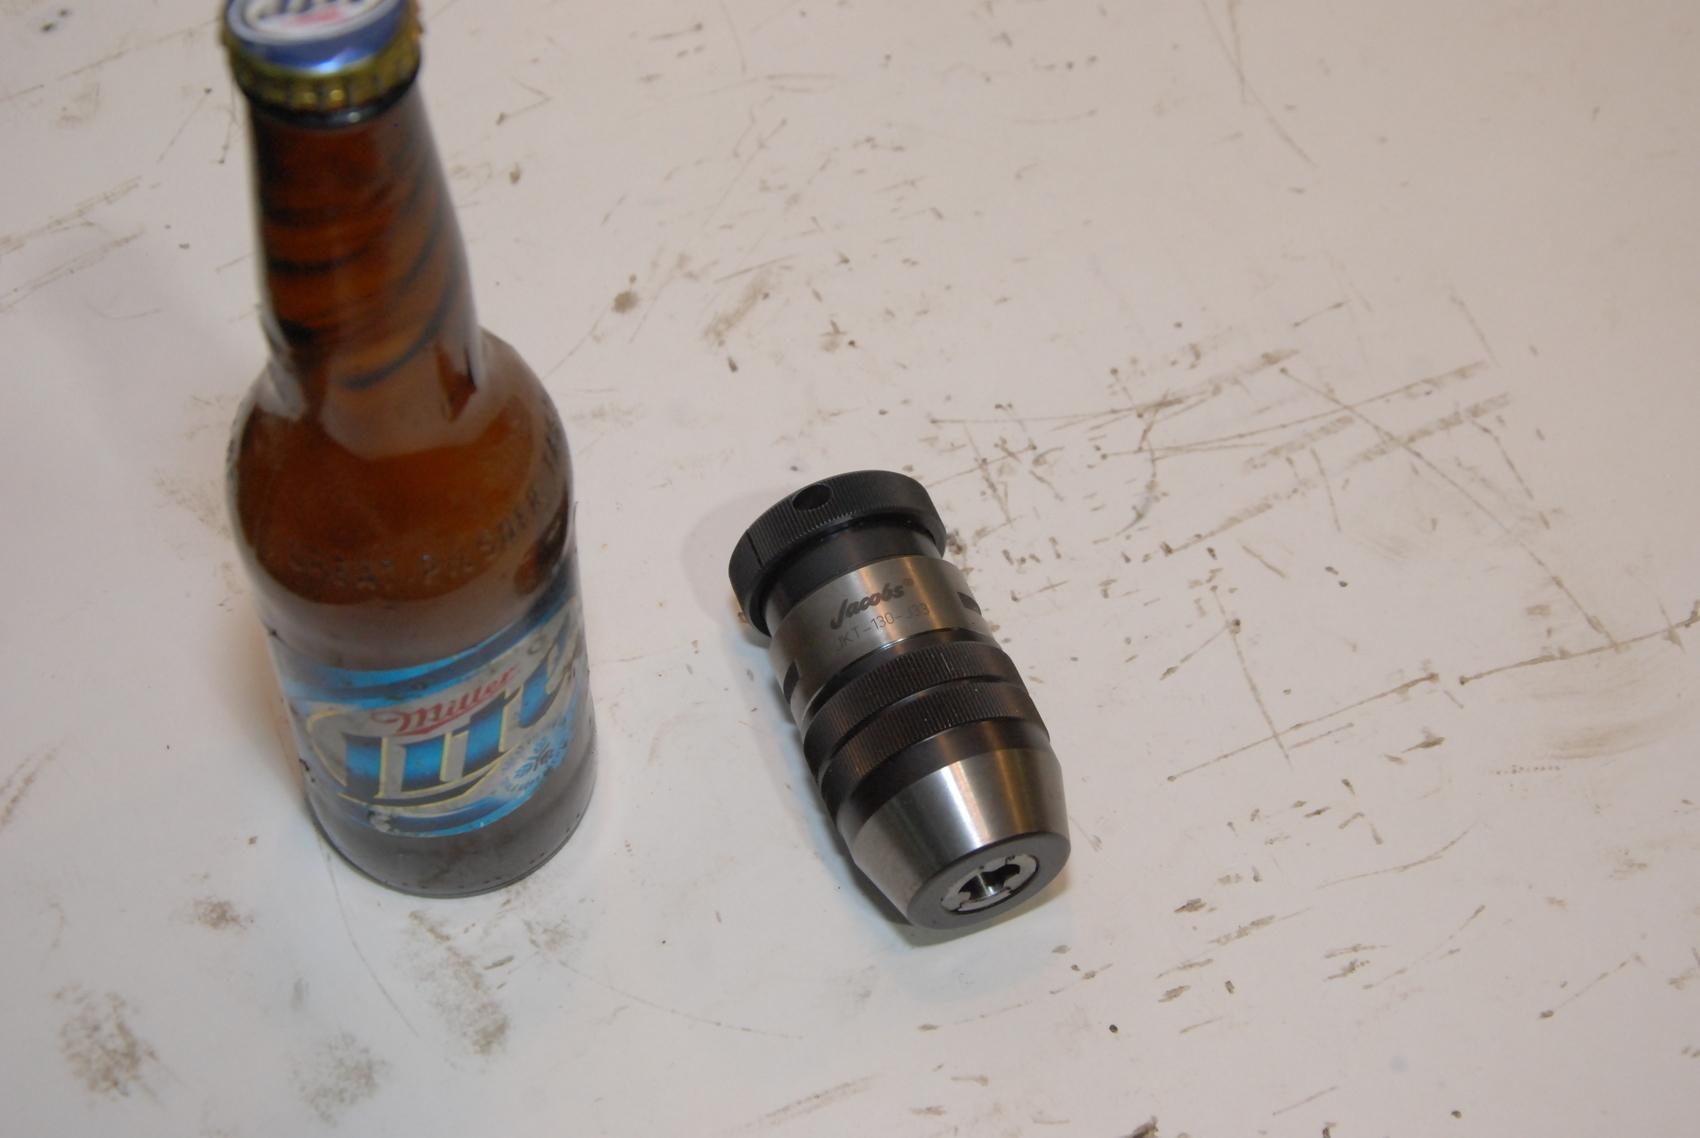 Jacobs JKT130-J33 Hi-Torque Industrial Keyless Drill Chuck